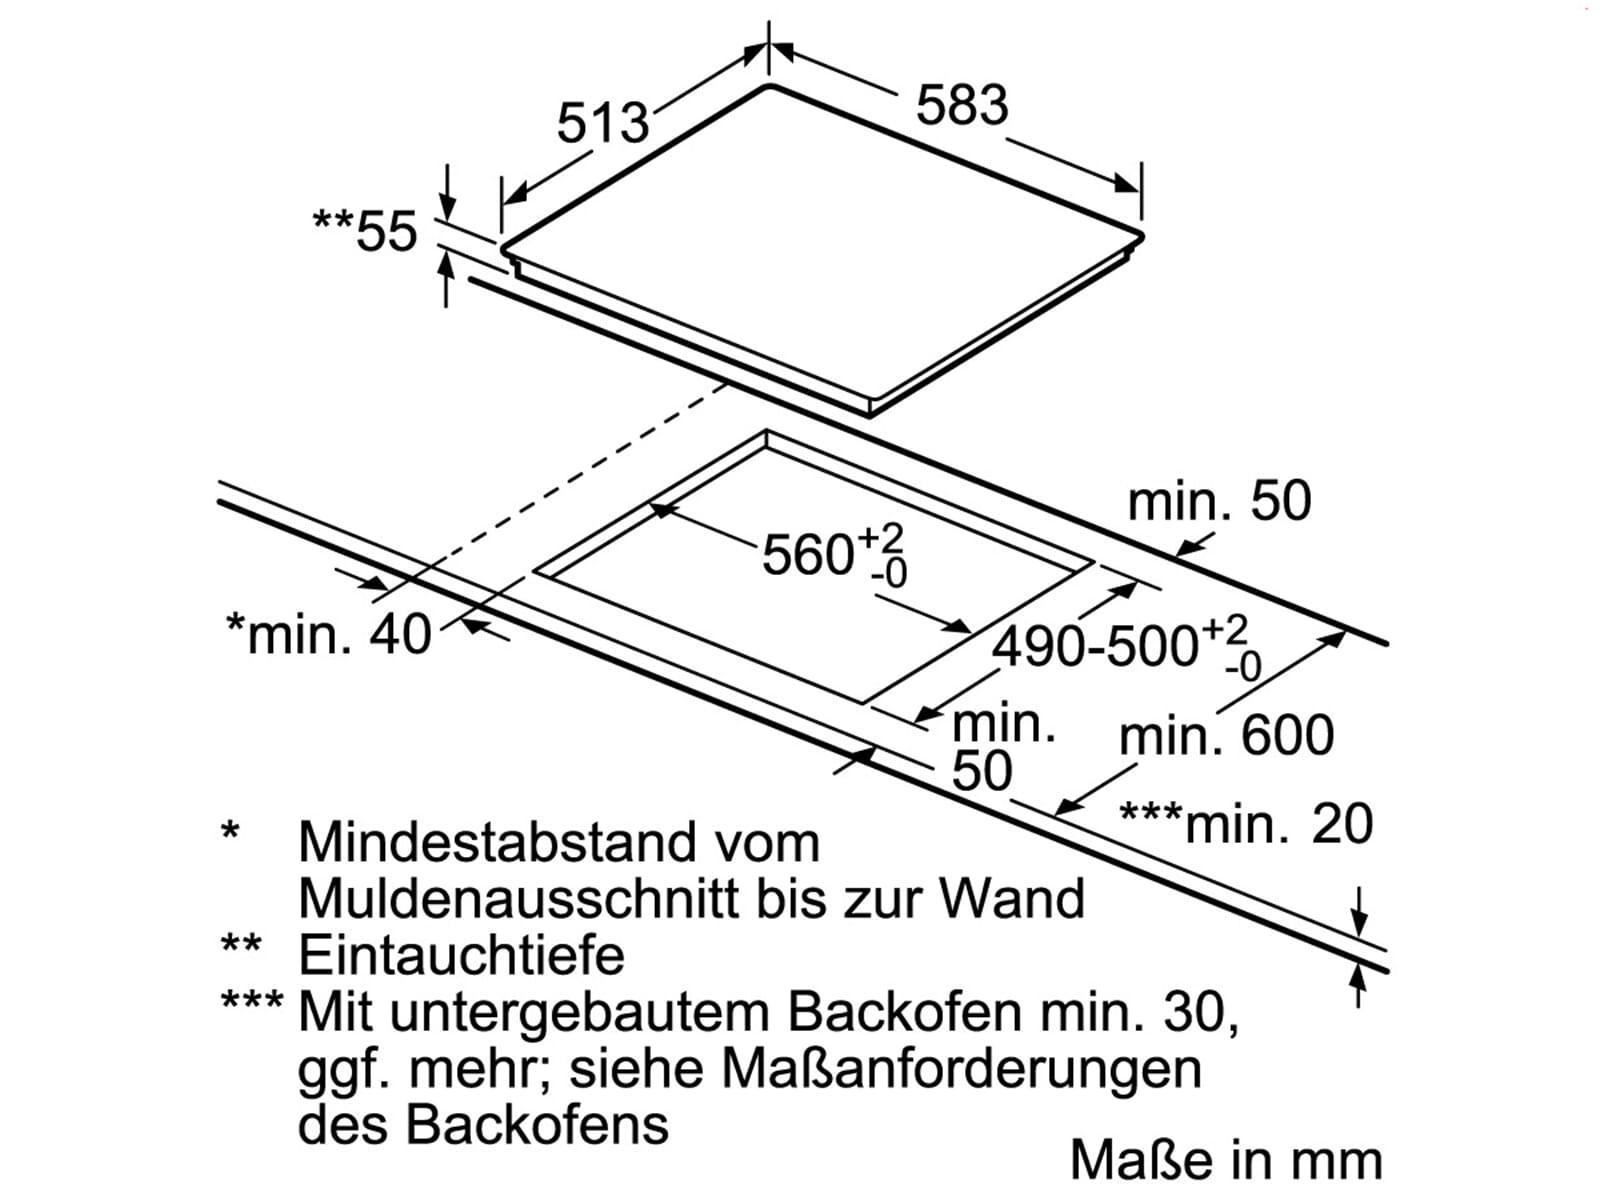 siemens eh645beb1e induktionskochfeld autark. Black Bedroom Furniture Sets. Home Design Ideas